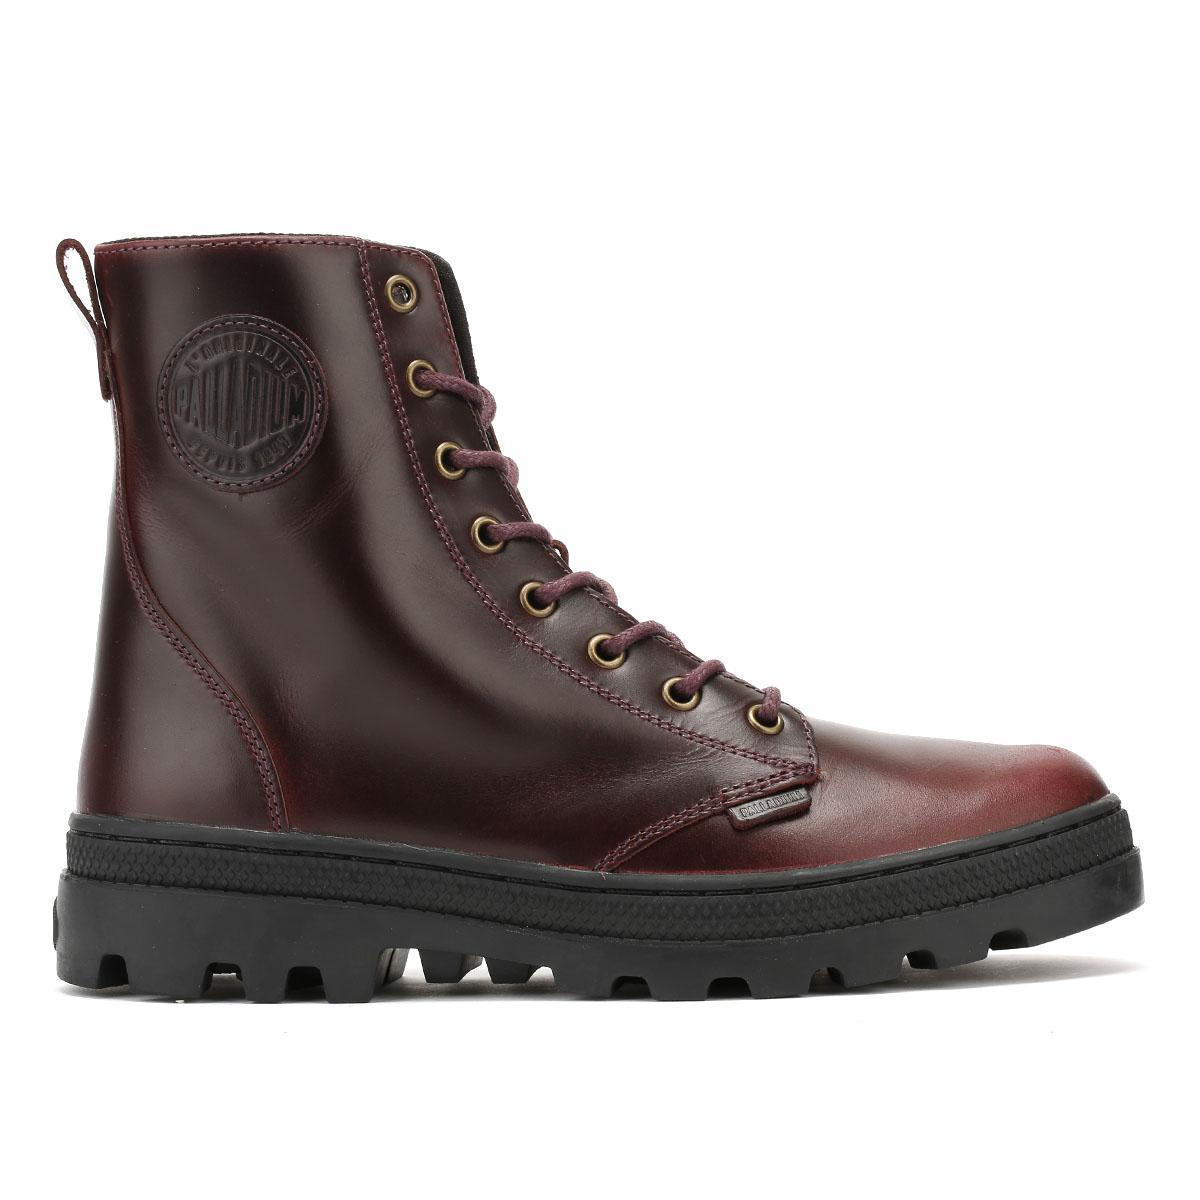 d25898c915e93 Palladium Womens Regal Burgundy Pallabosse Off Boots in Brown - Lyst